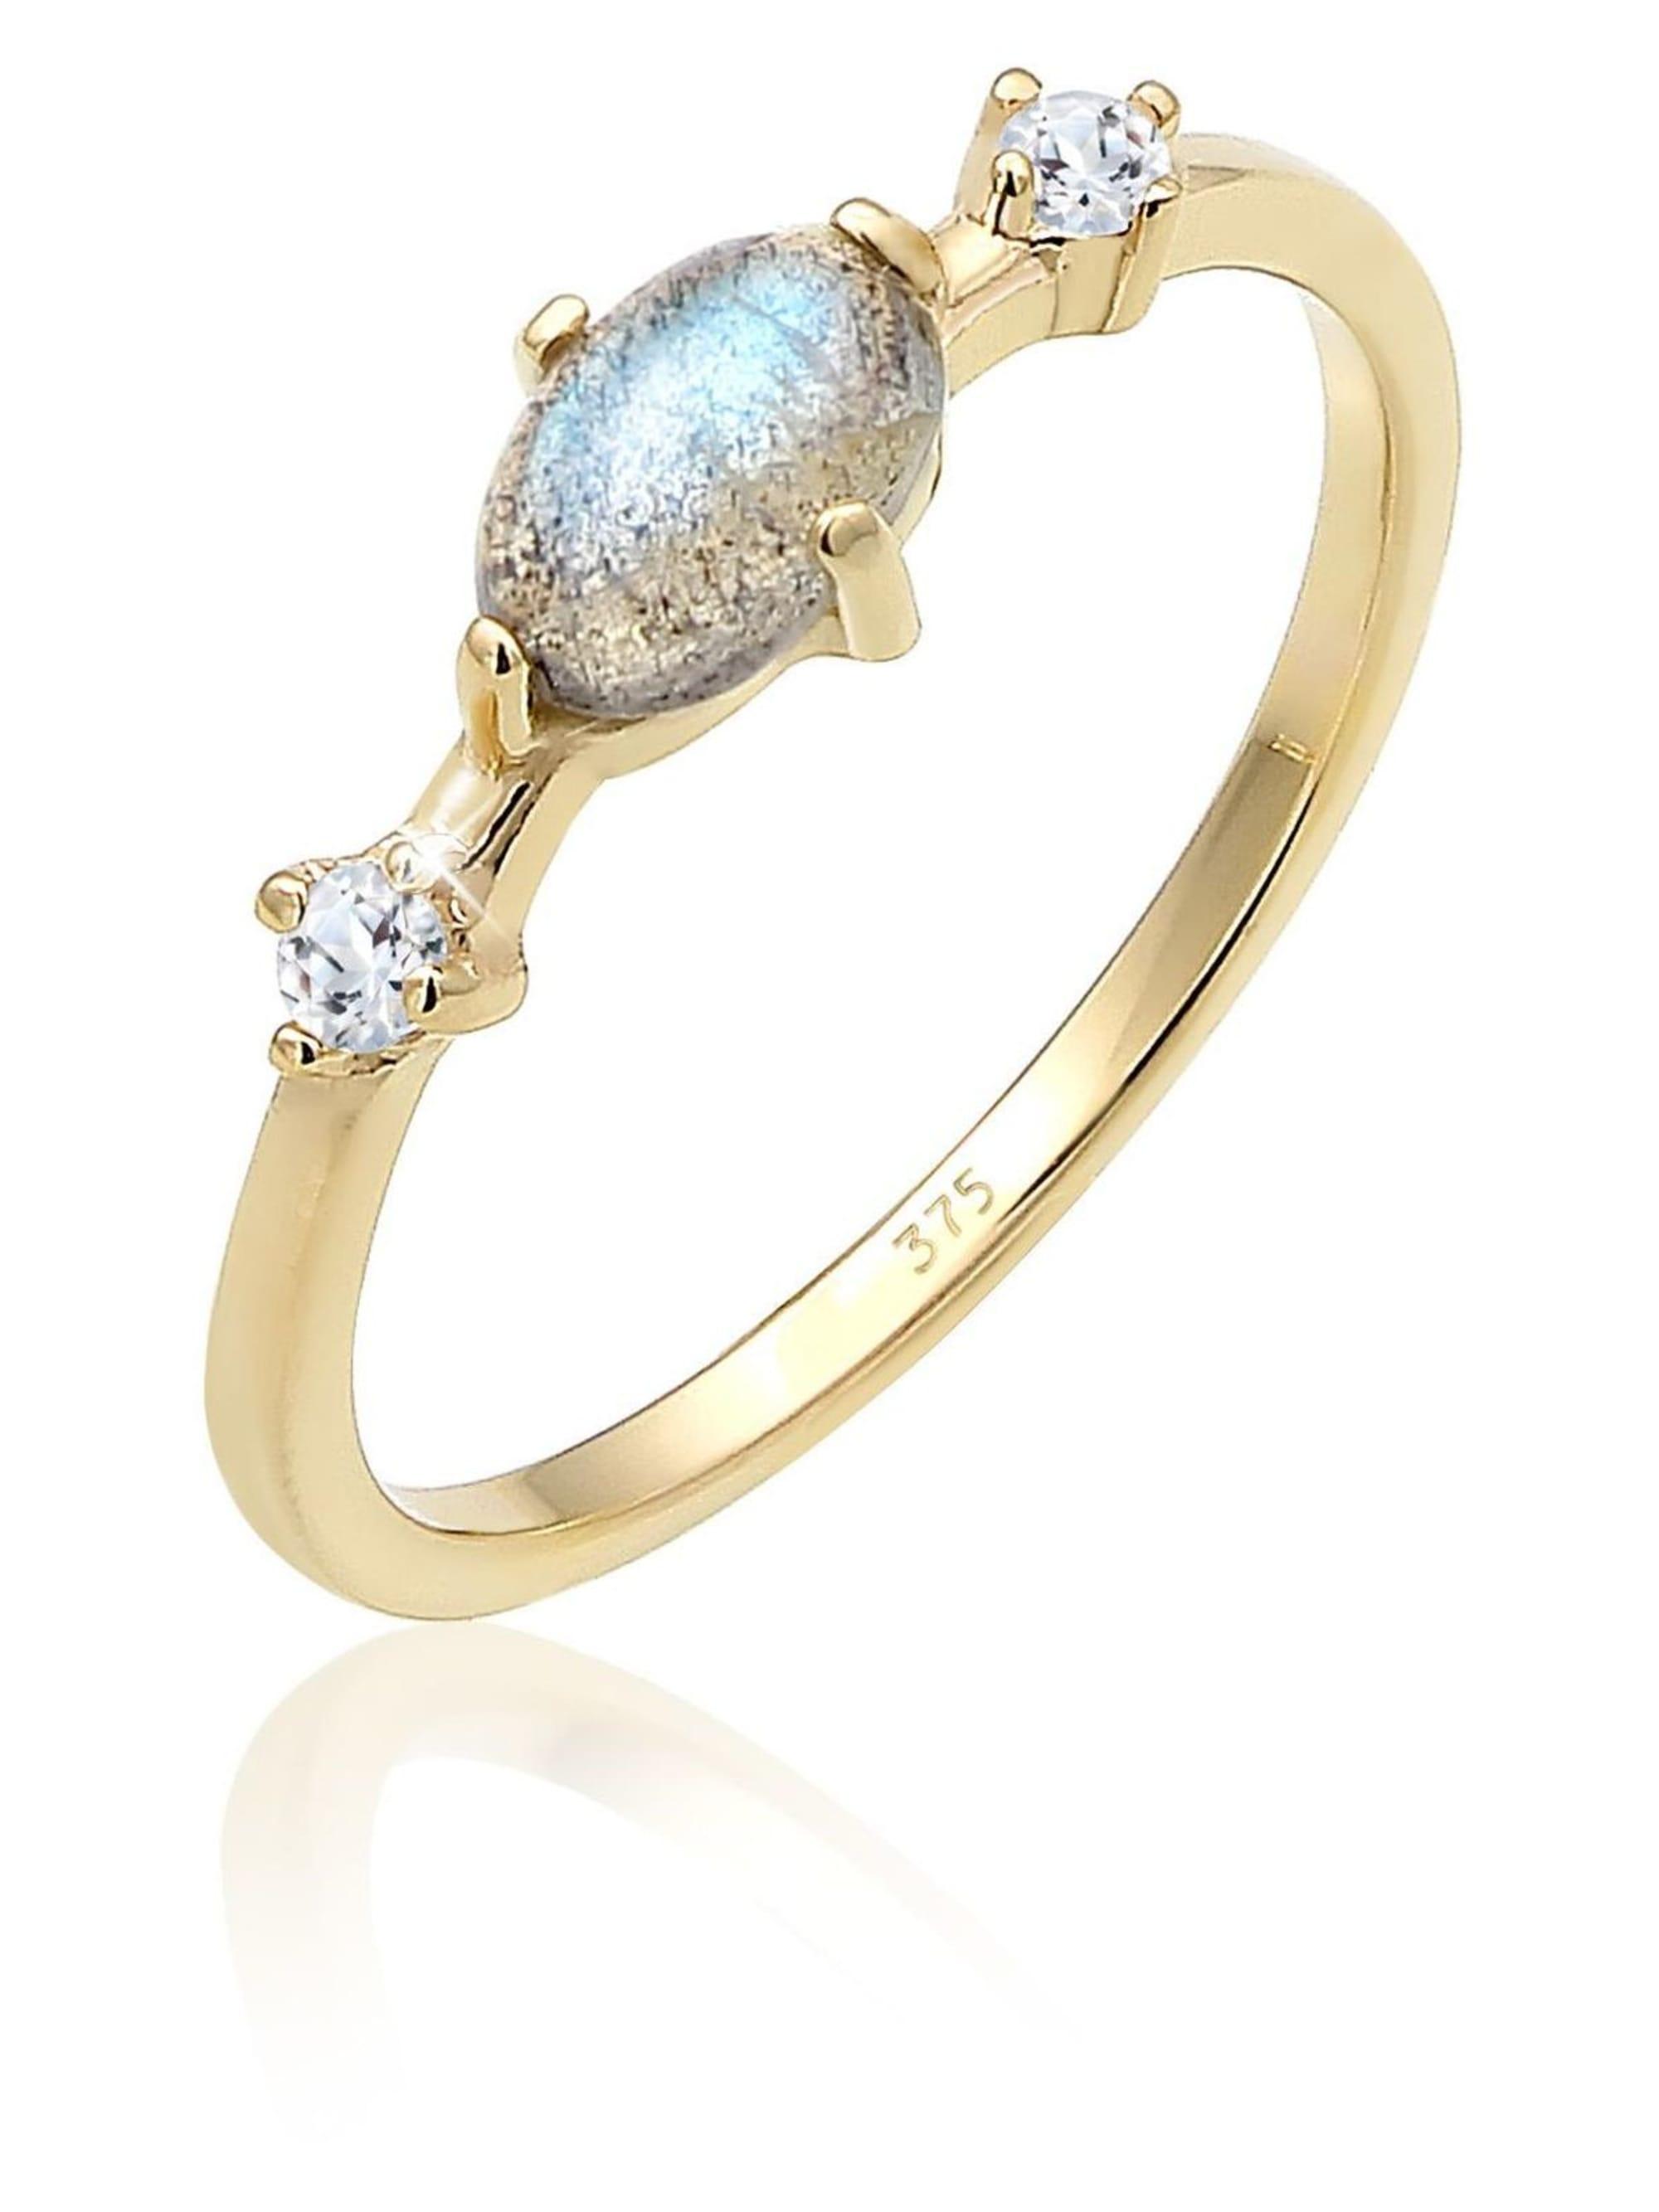 Elli Premium Elli Premium Ring Bandring Labradorit Topas Edelstein 375er Gelbgold zMnG0